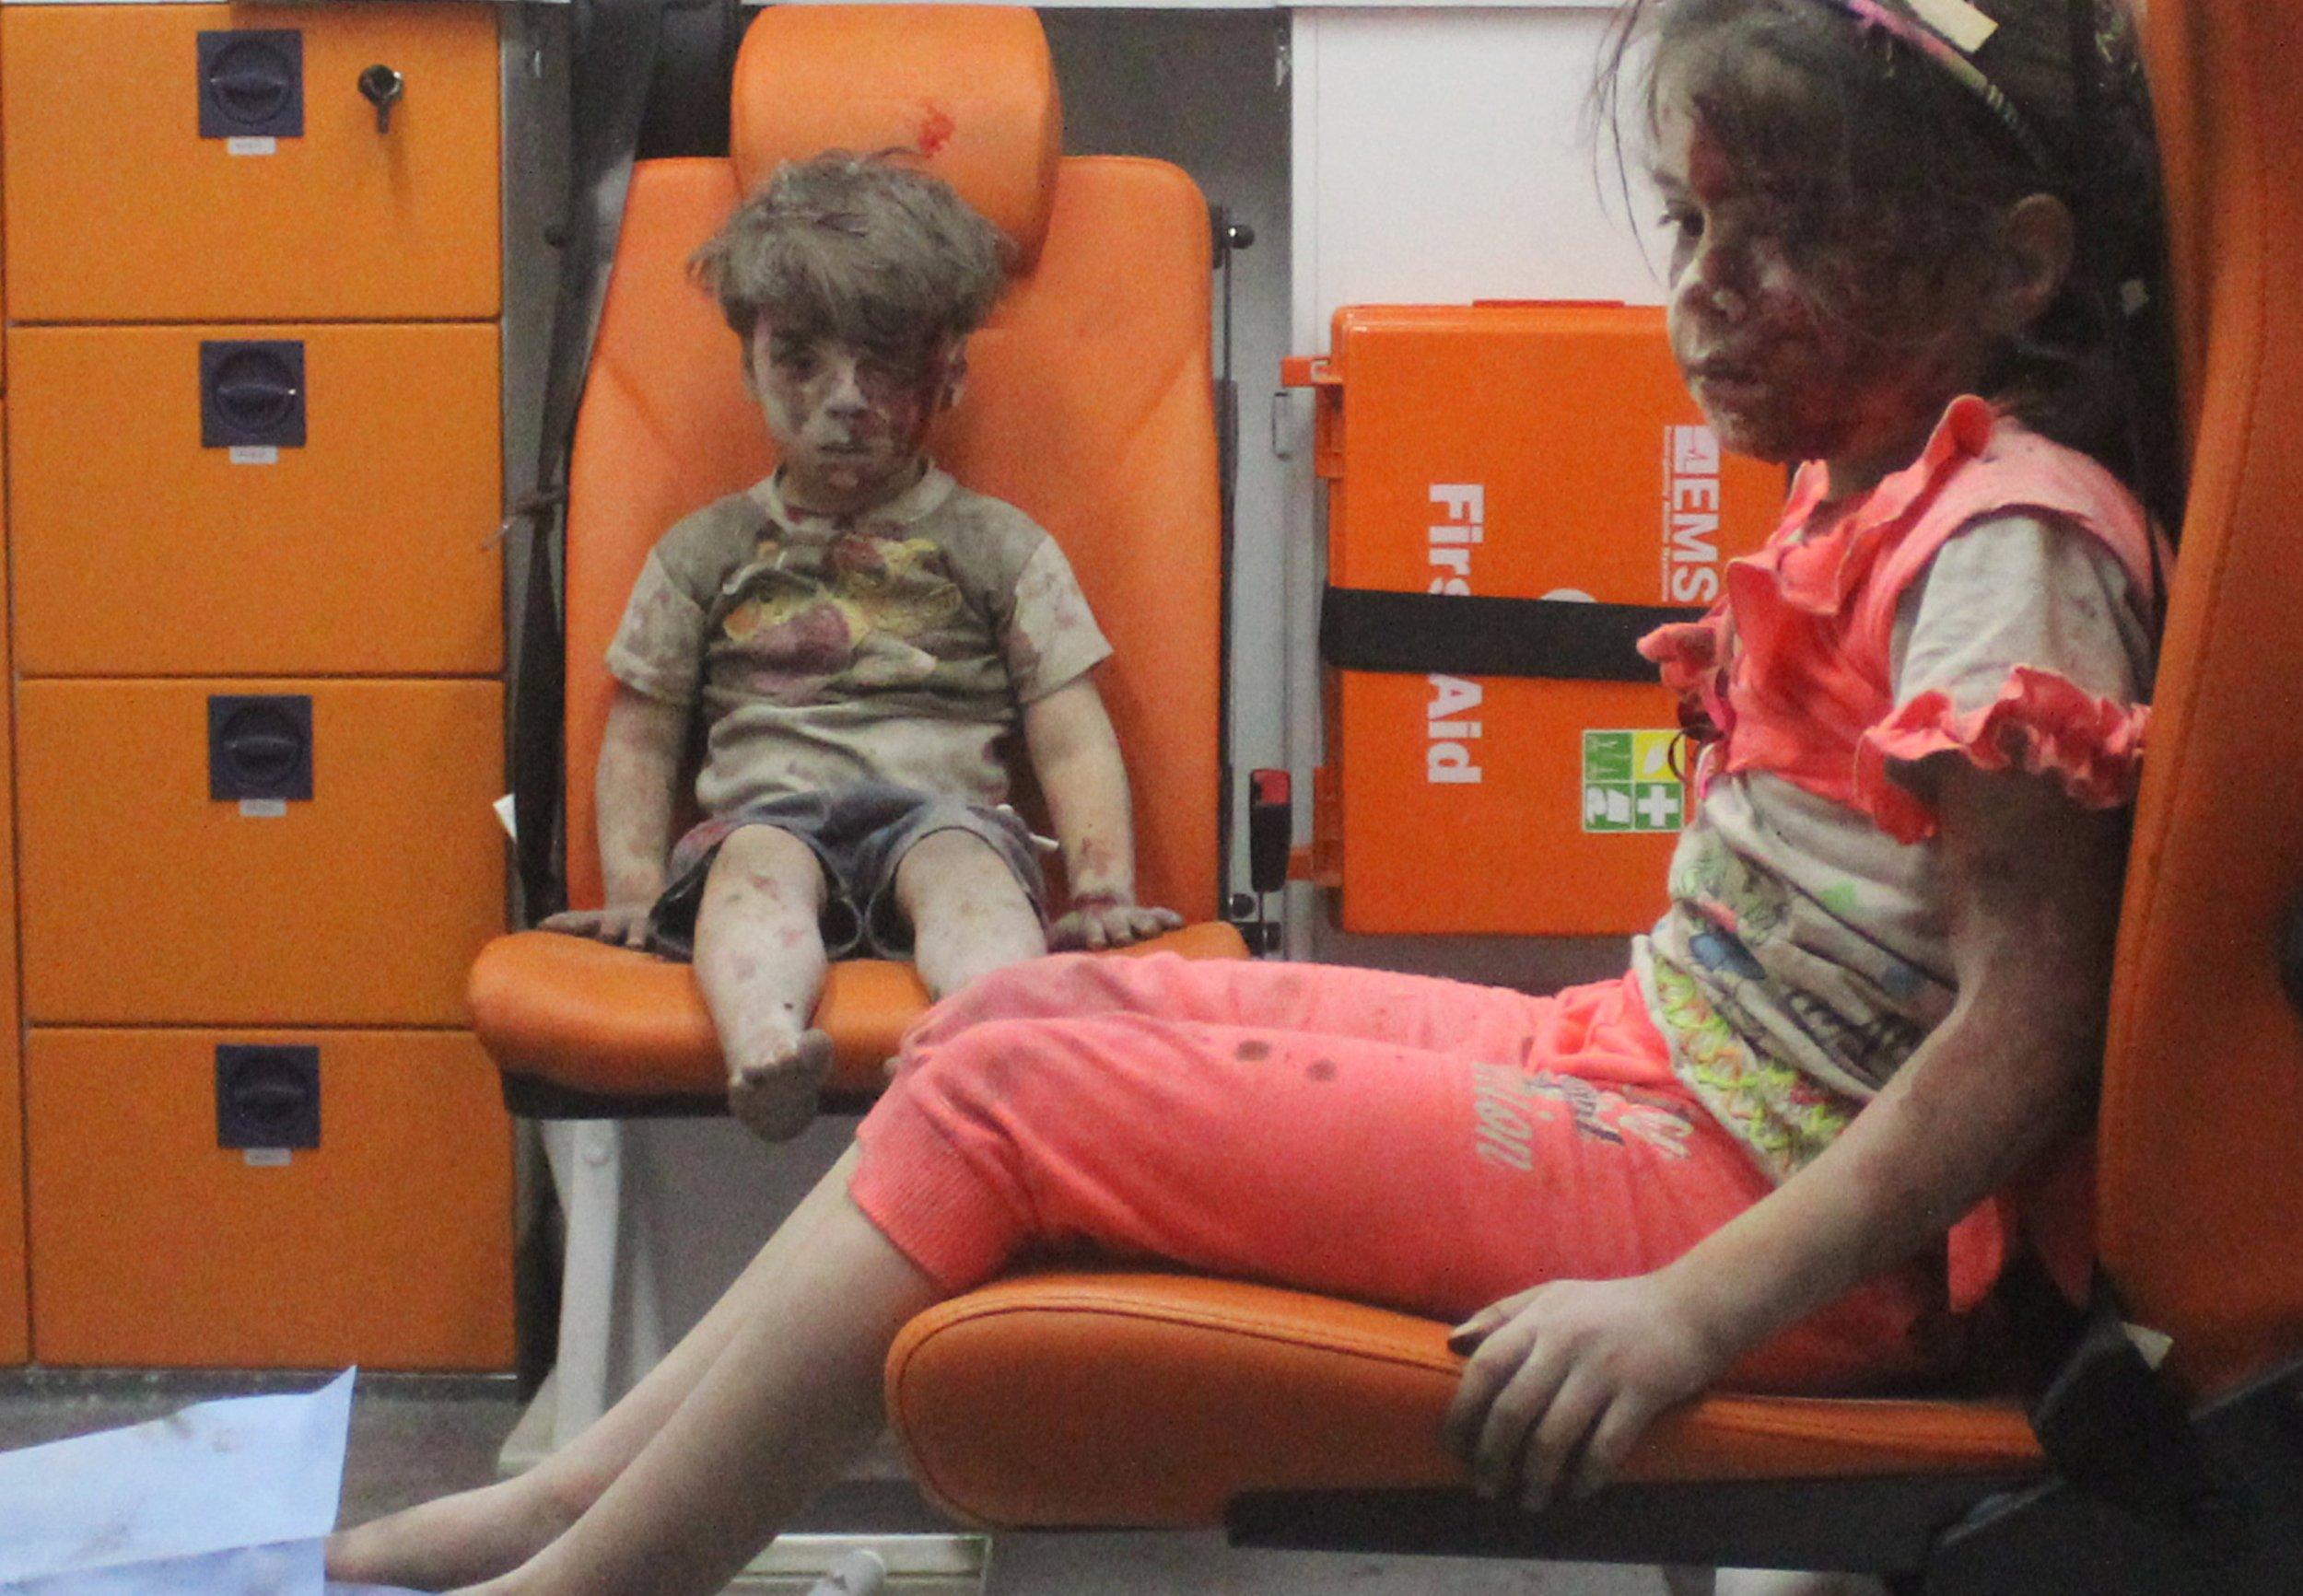 08_23_Syria_Refugee_01